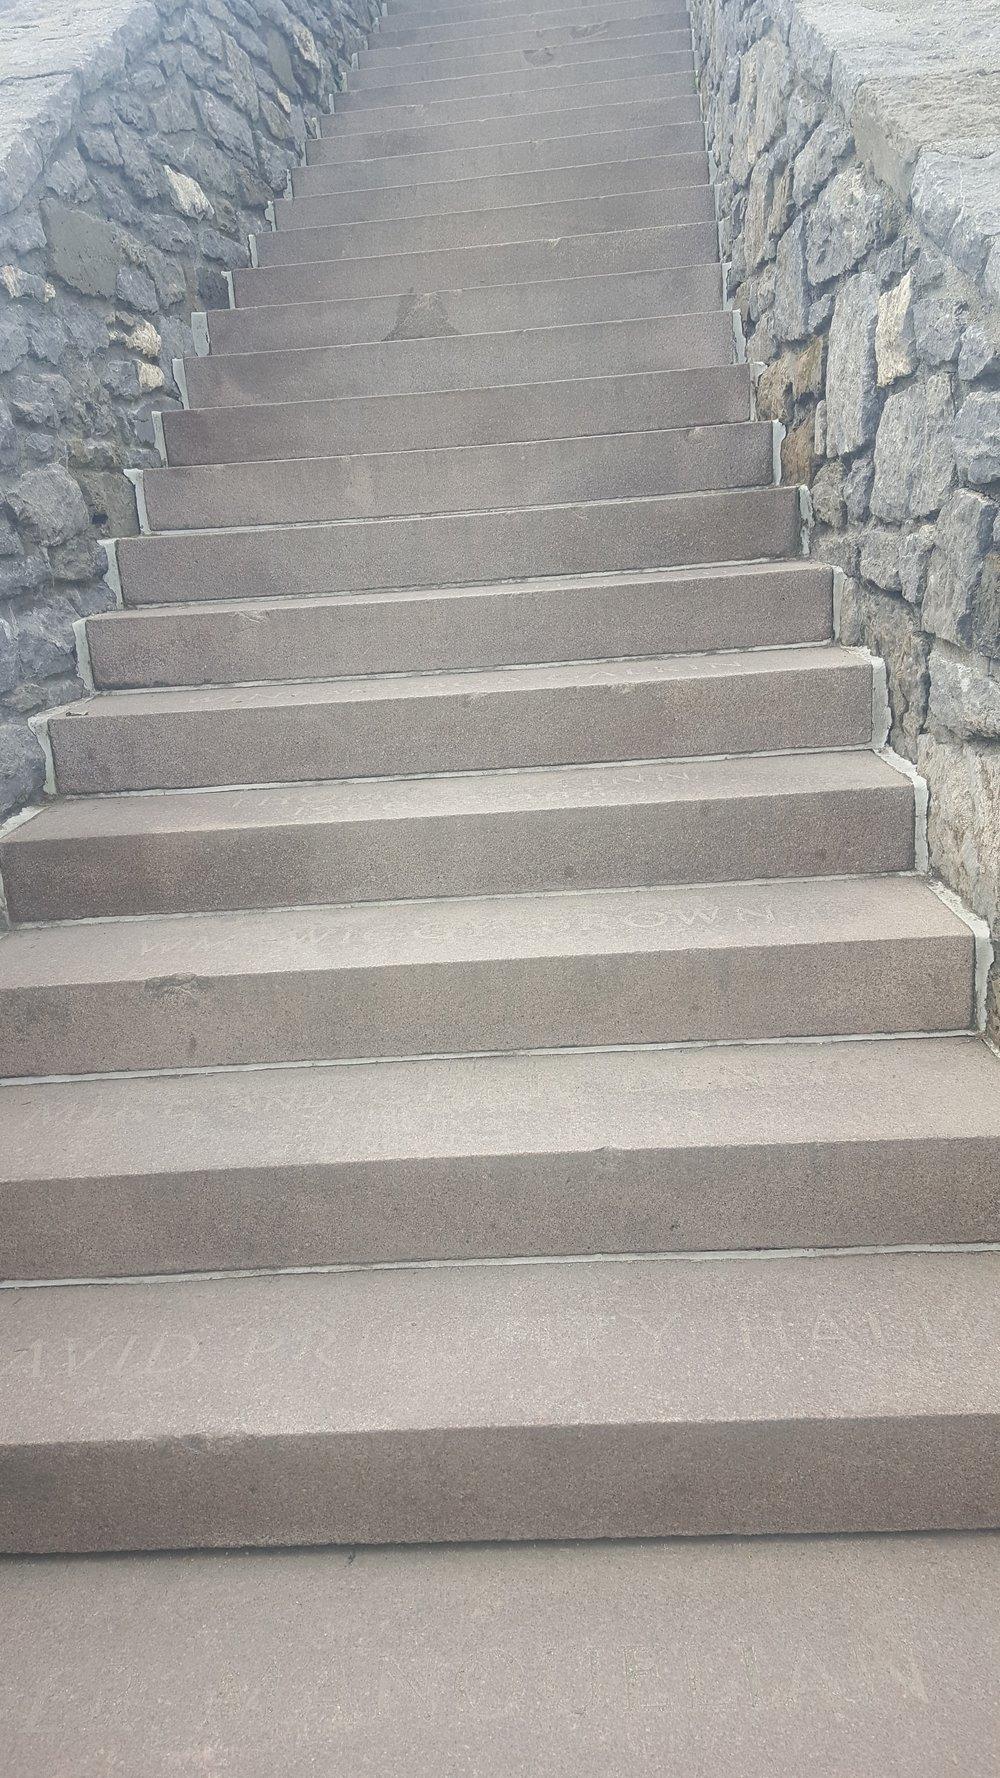 Rhode Island Cliff Walk 40 Steps 2